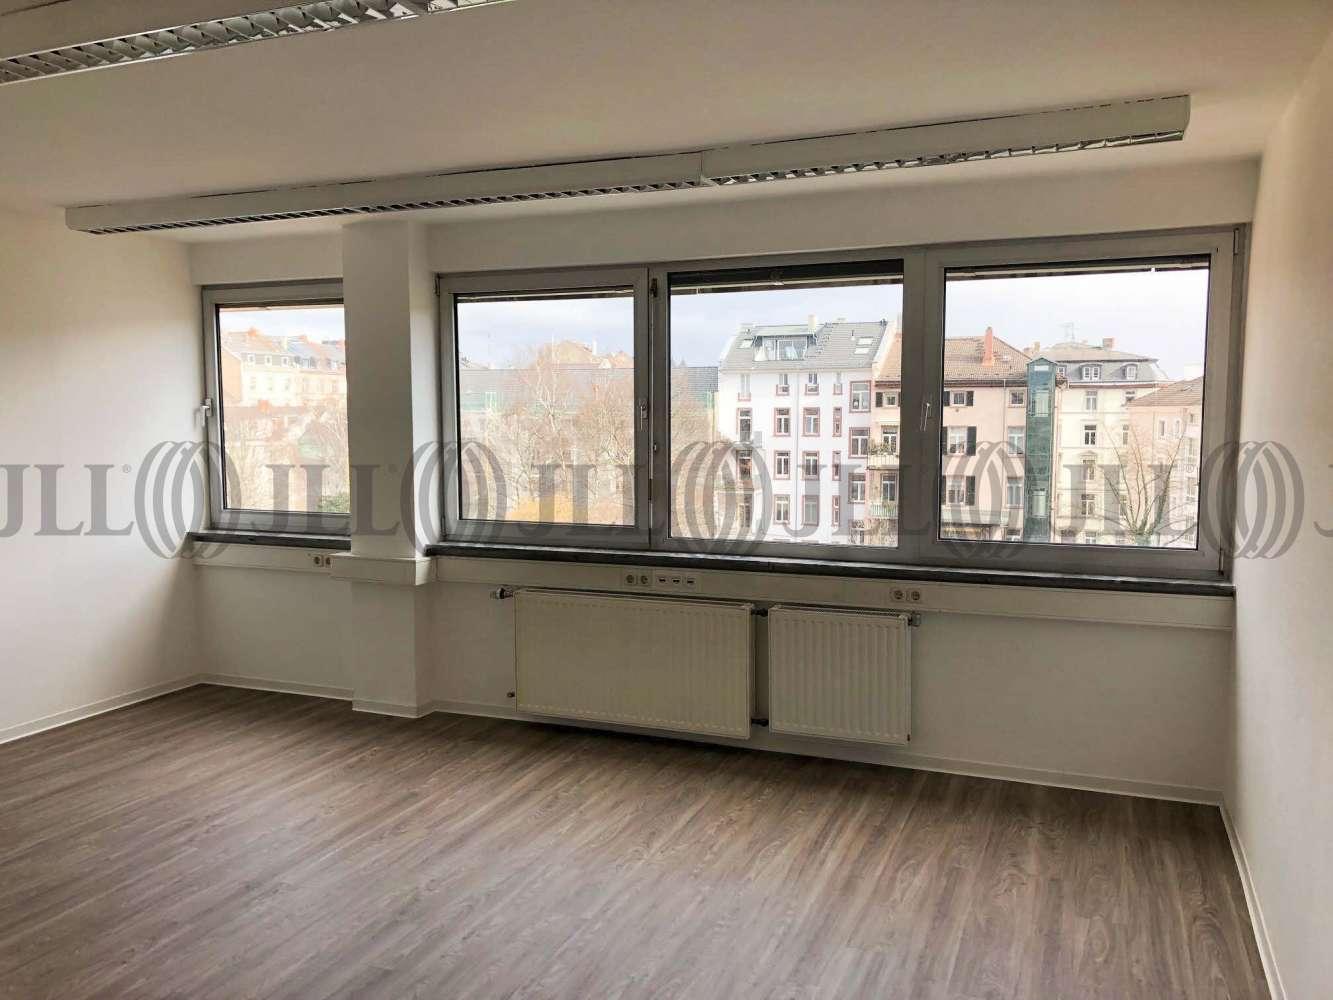 Büros Frankfurt am main, 60318 - Büro - Frankfurt am Main, Nordend-West - F1458 - 10563695